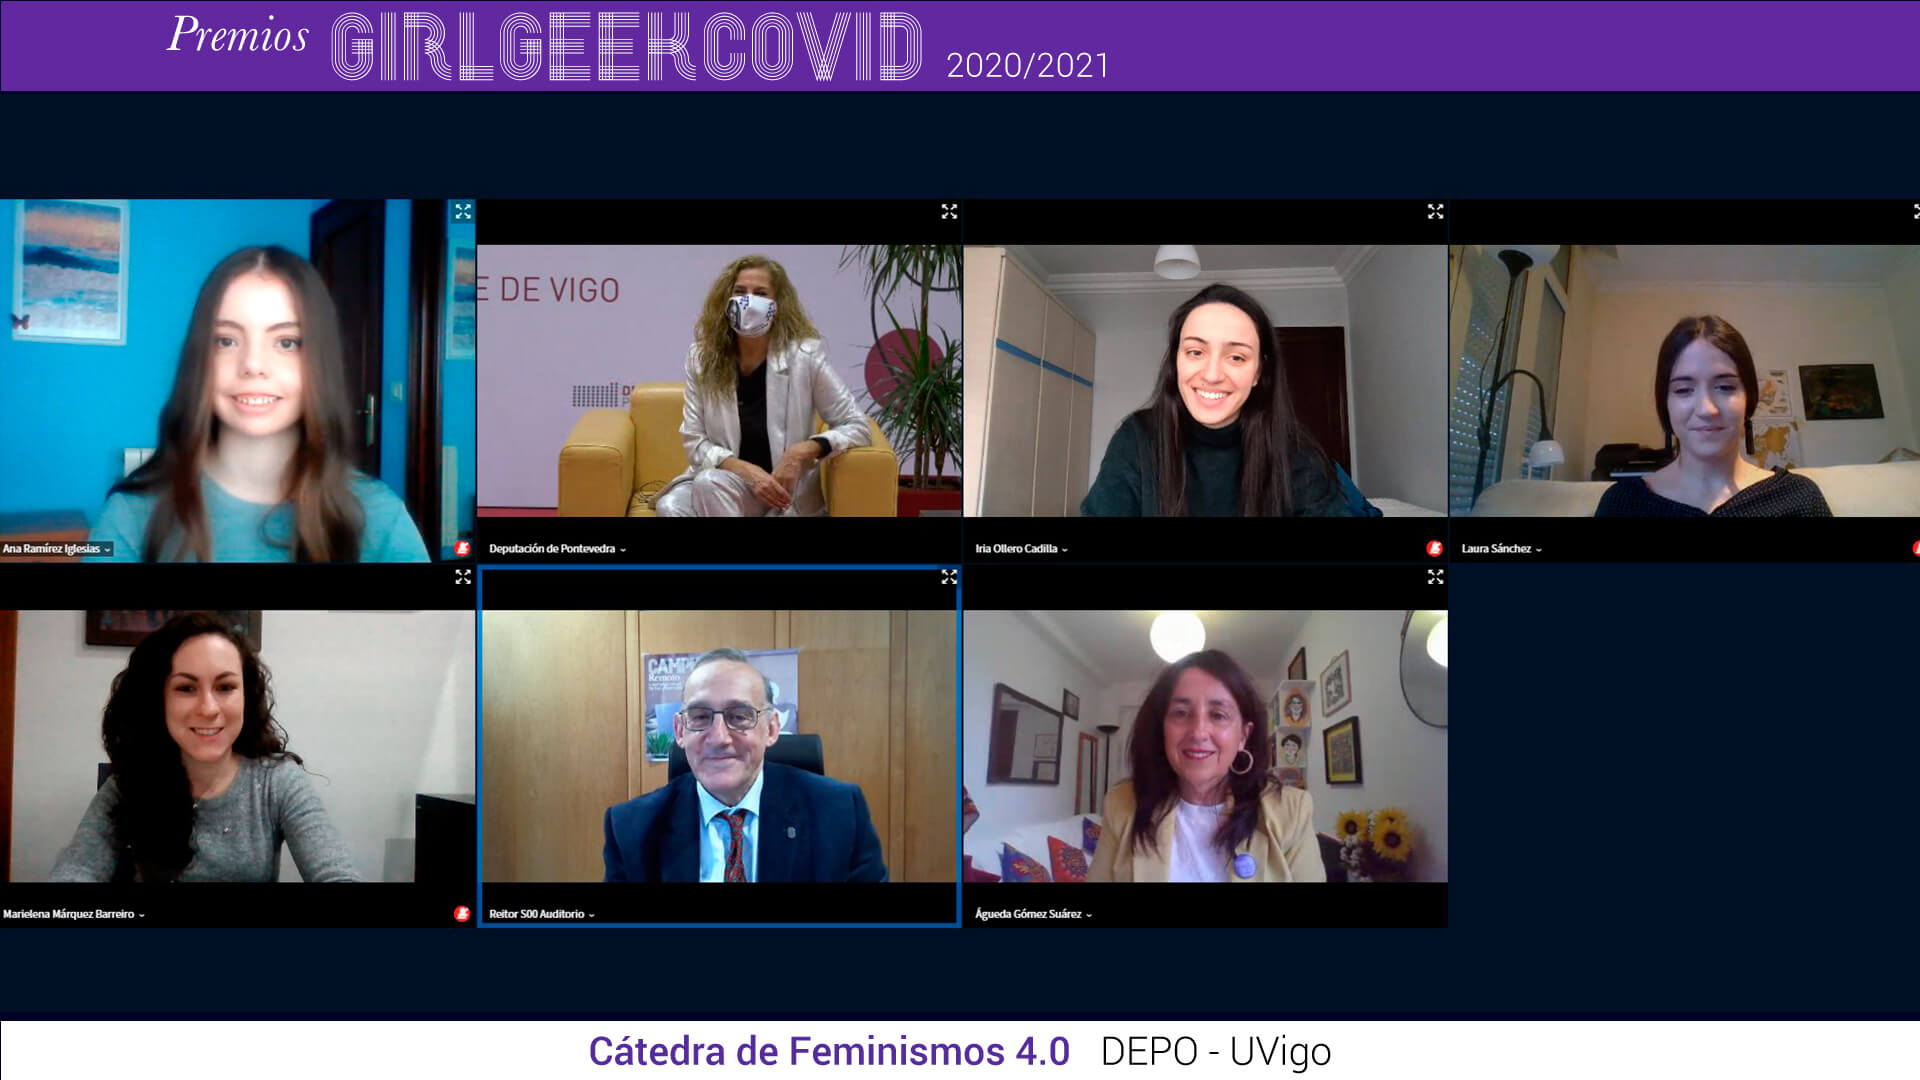 Premios Girl Geek Covid foto participantes